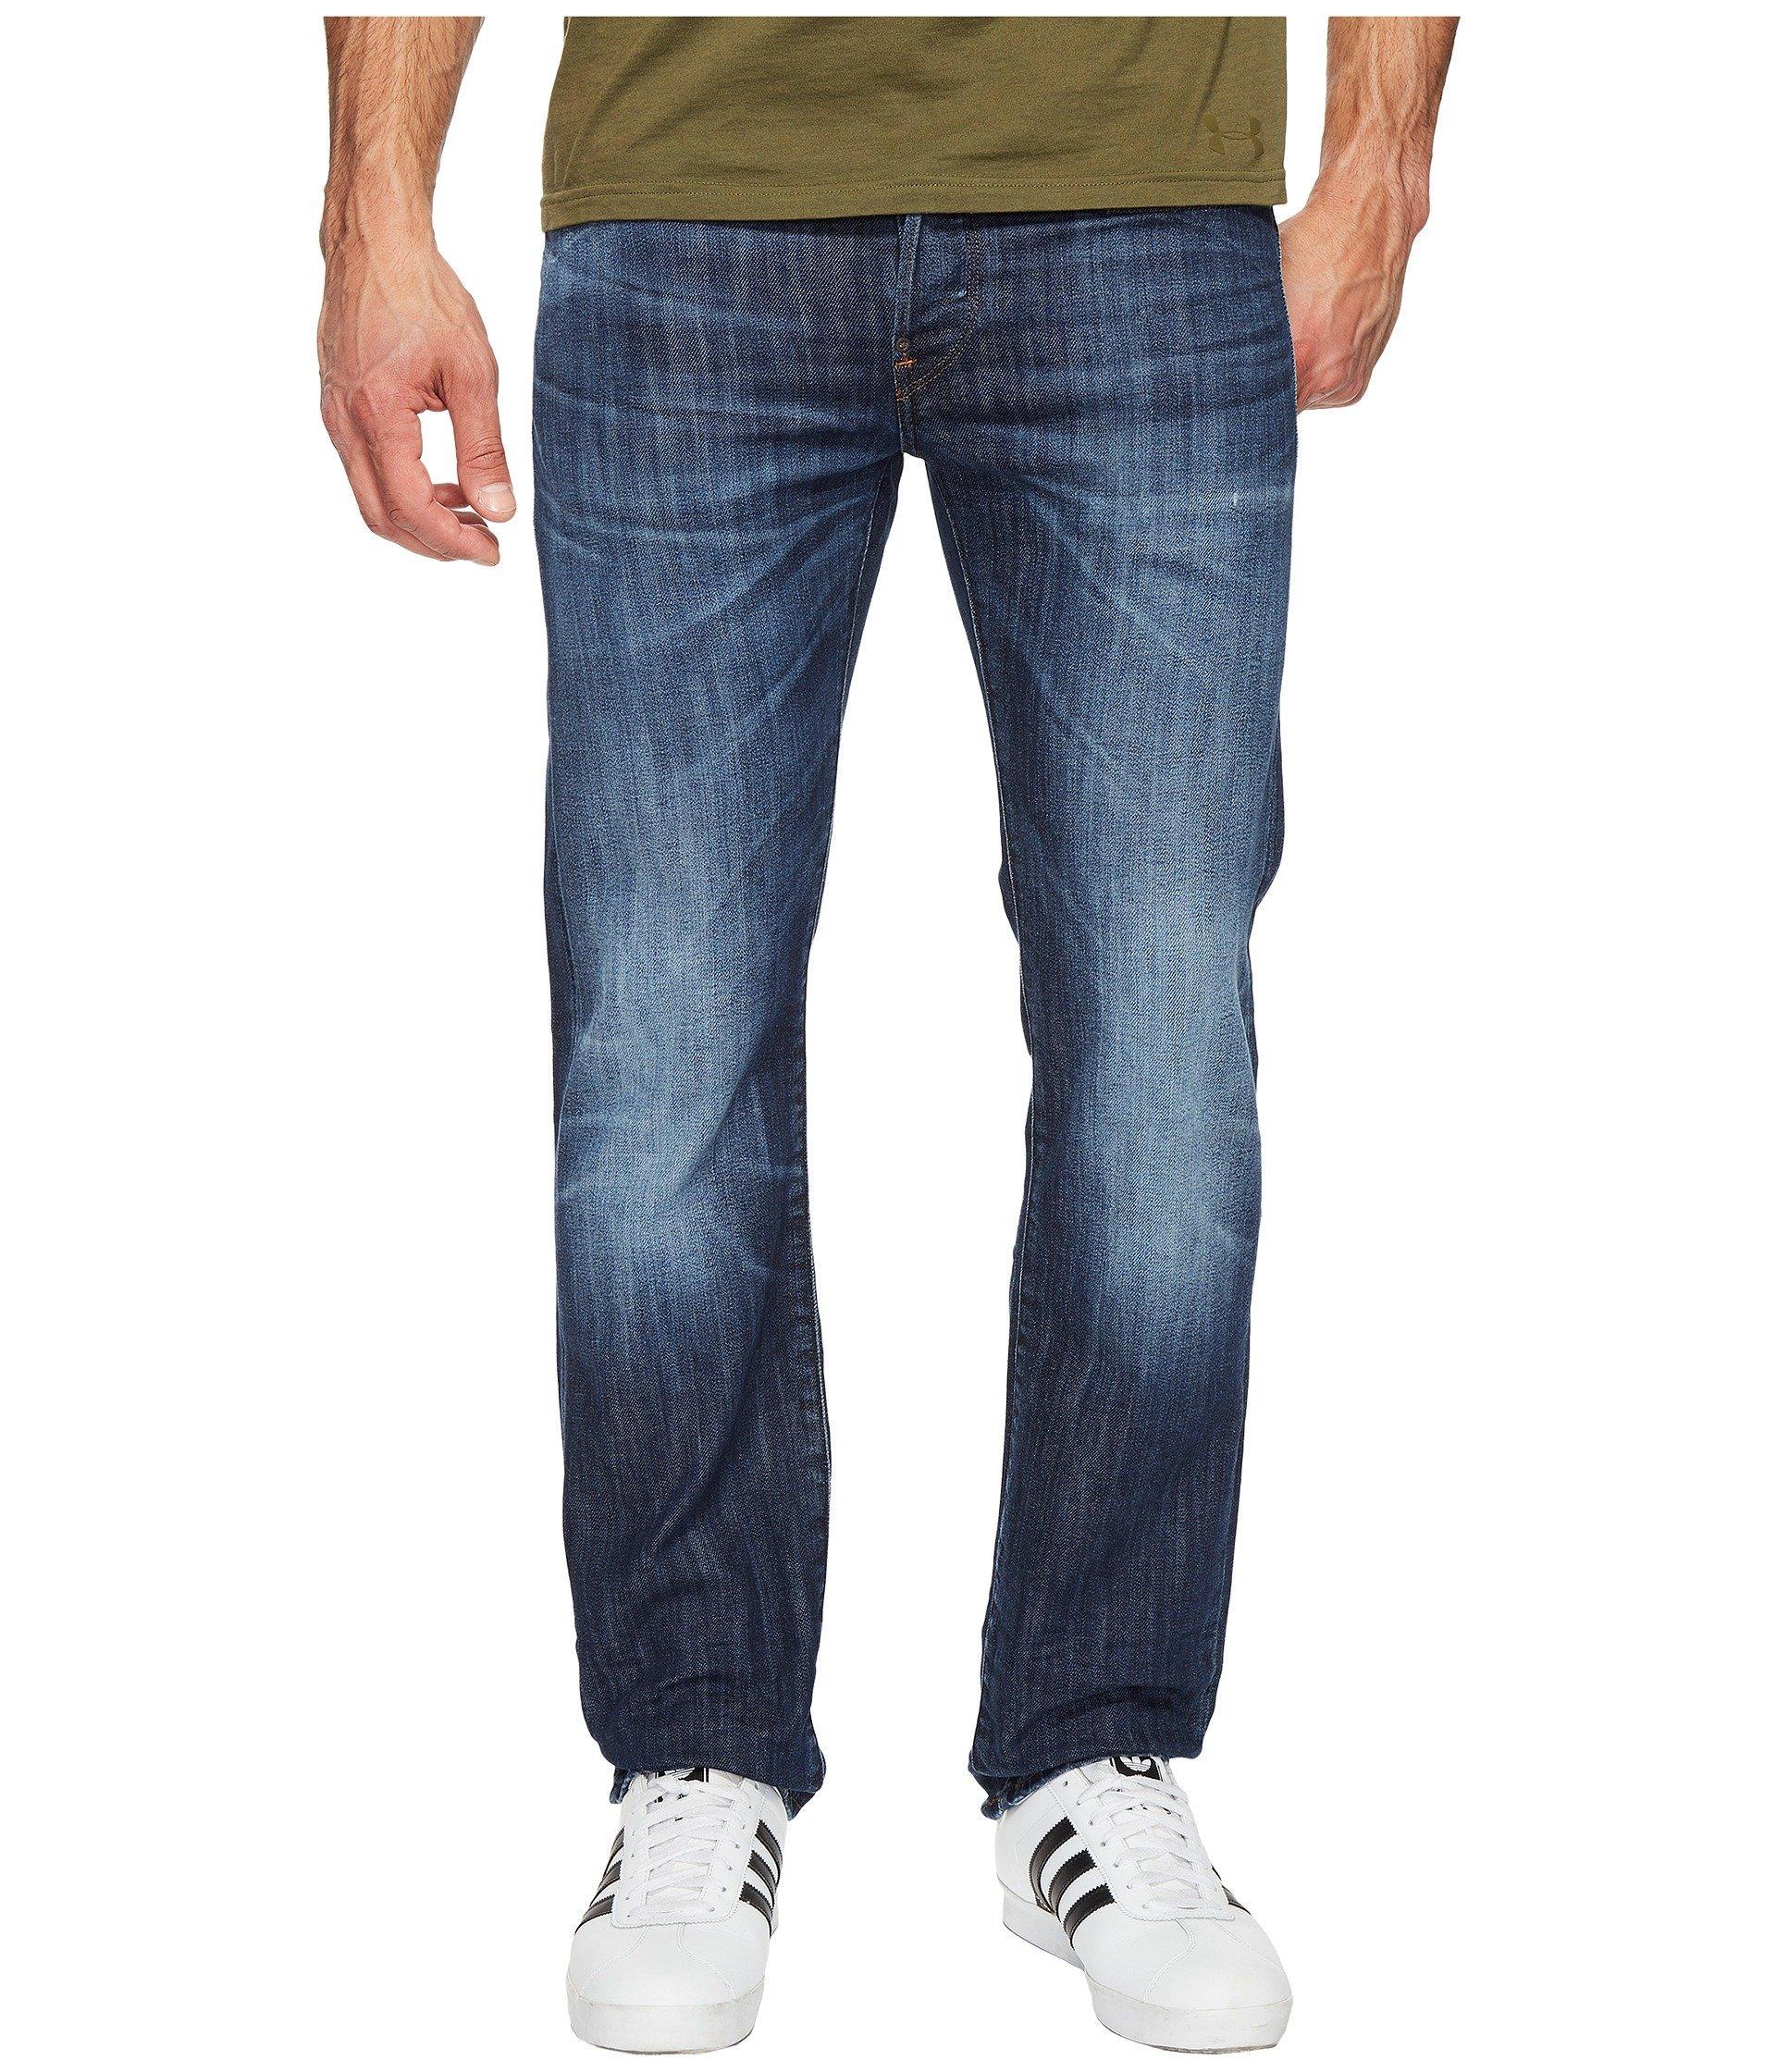 G-Star Attacc Straight Fit Jeans In Blue Denim Stretch Denim Dark Aged